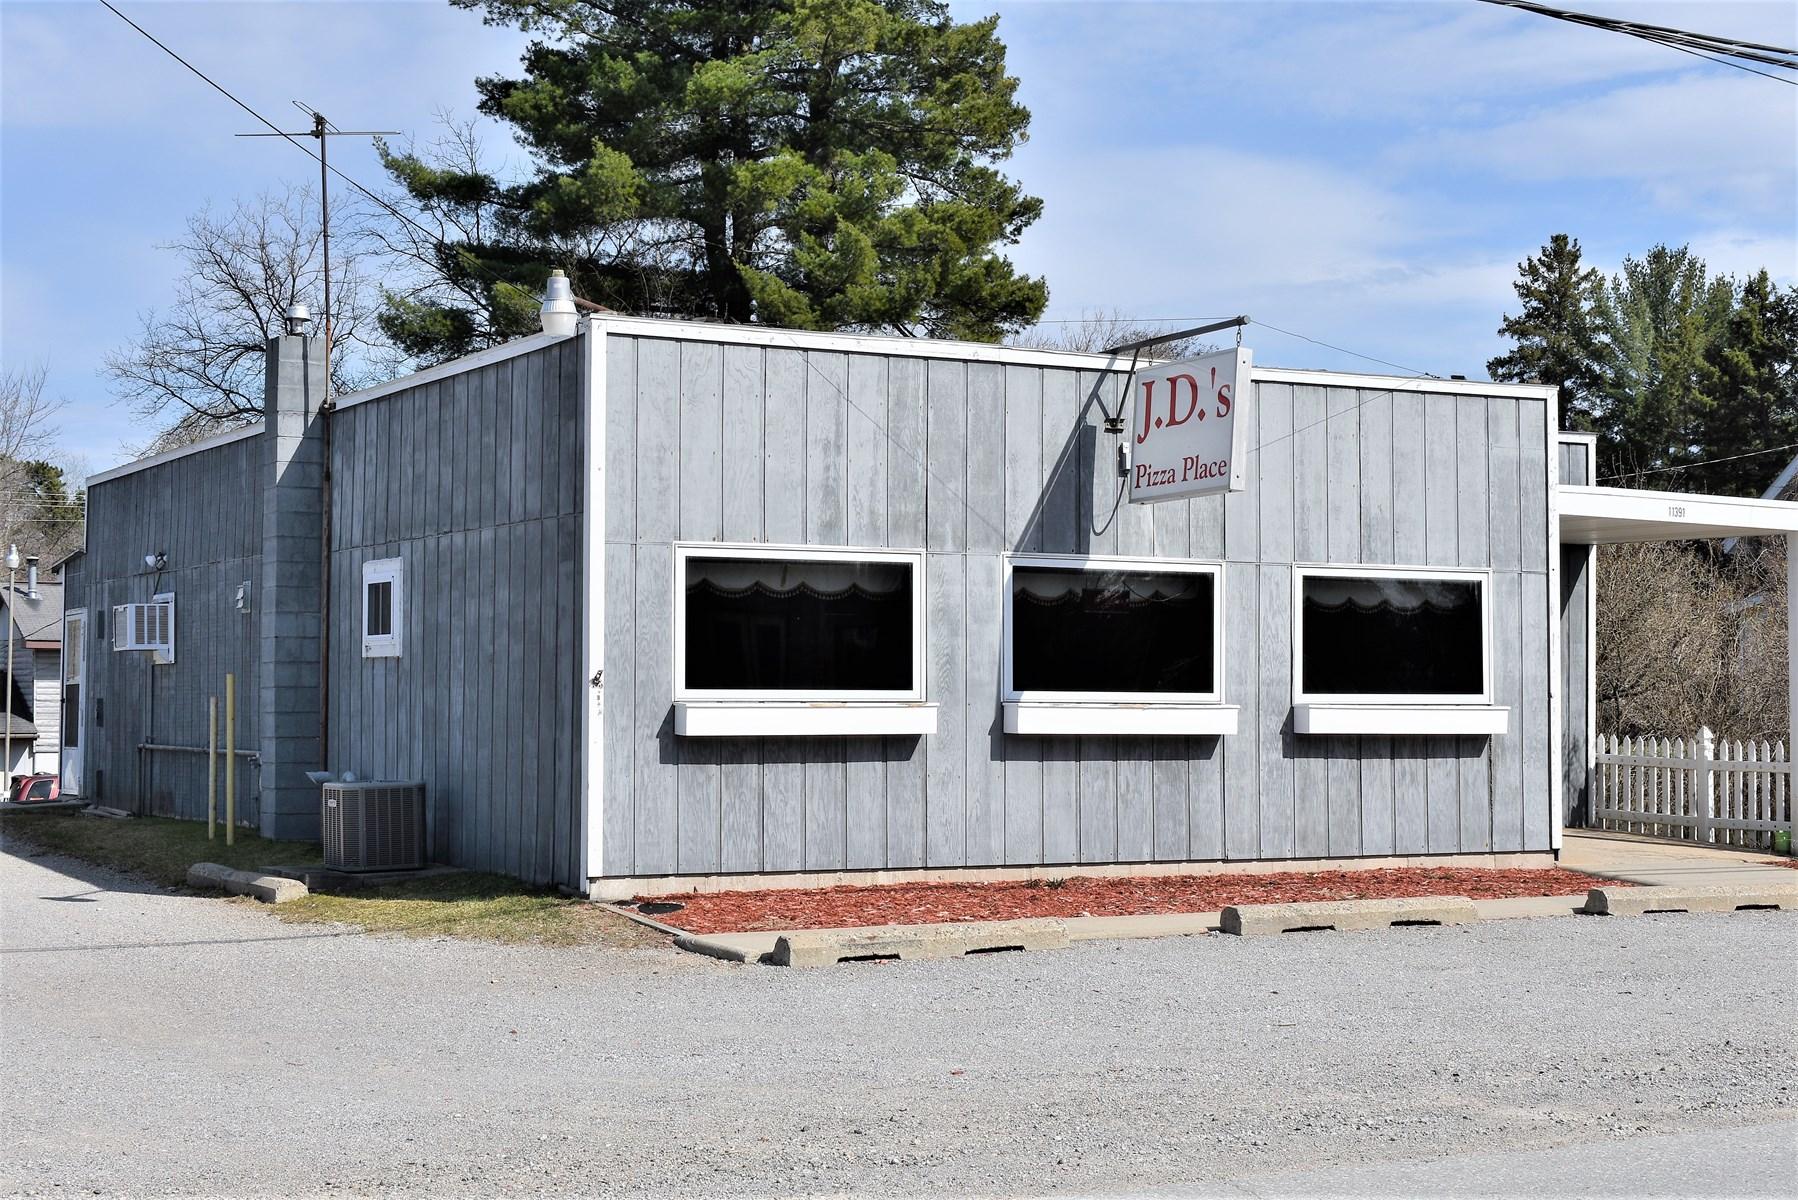 Michigan Pizzeria For Sale, Business Opportunity in Atlanta